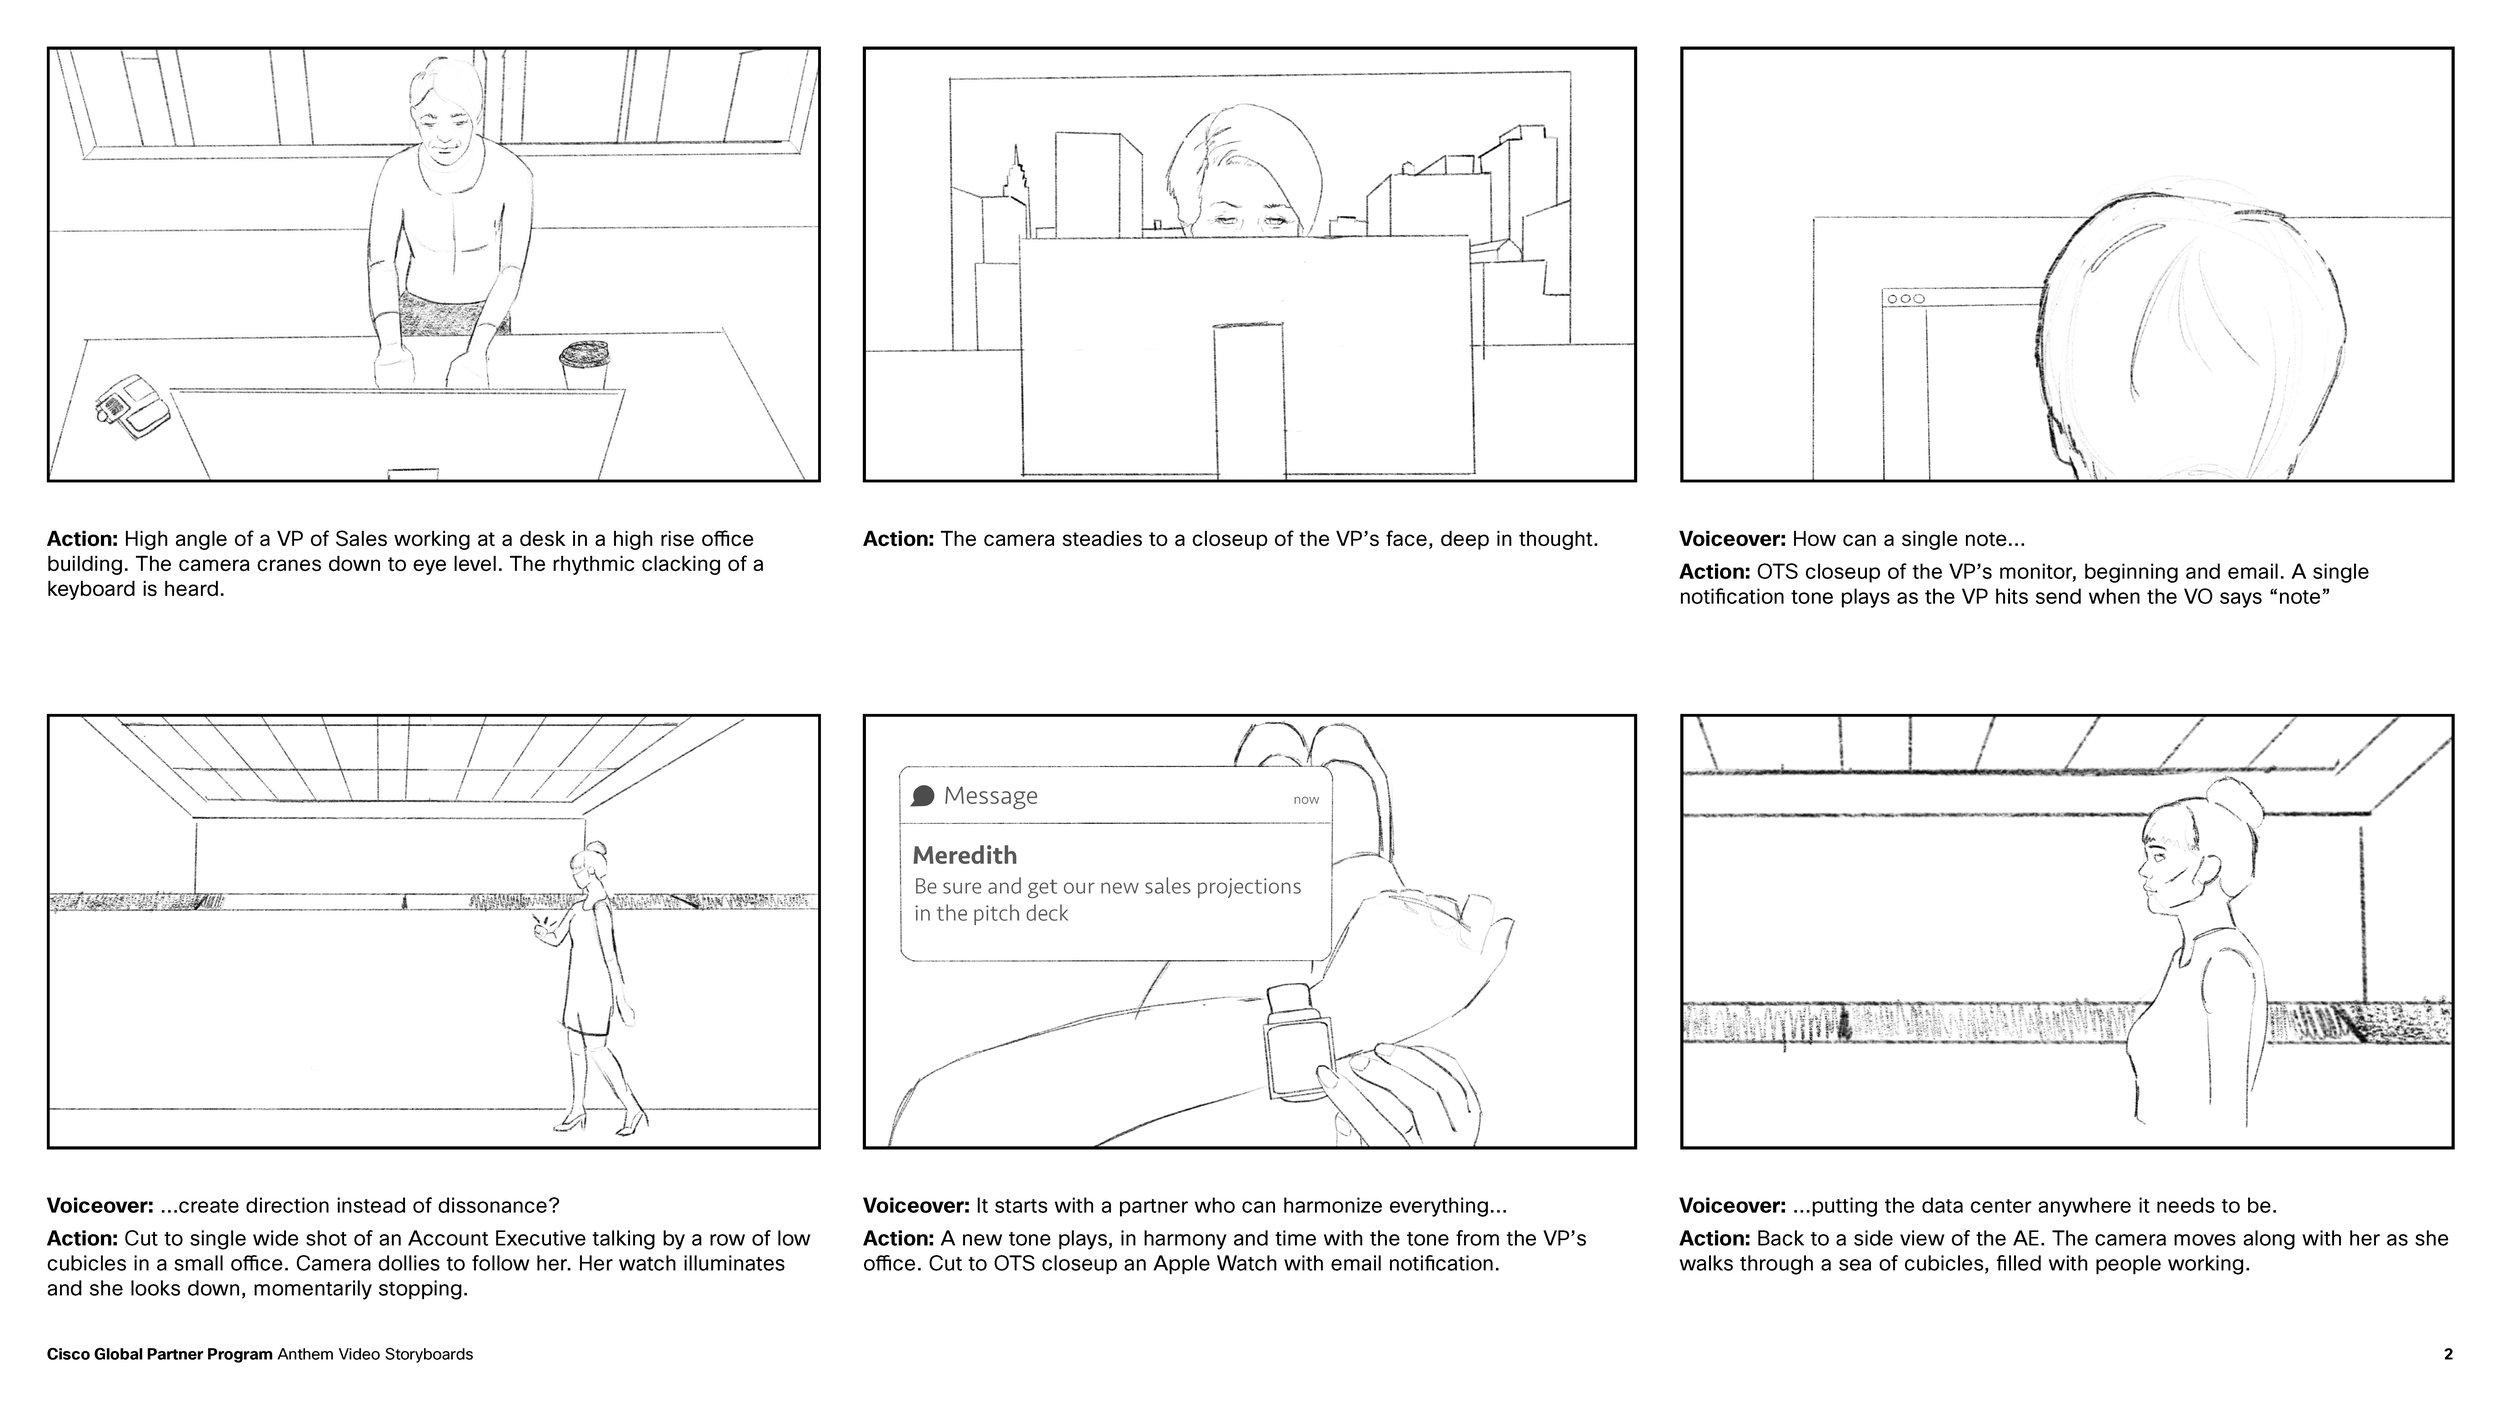 cisco-boundless-anthem-video-storyboards_r1_v2_Page_2.jpg